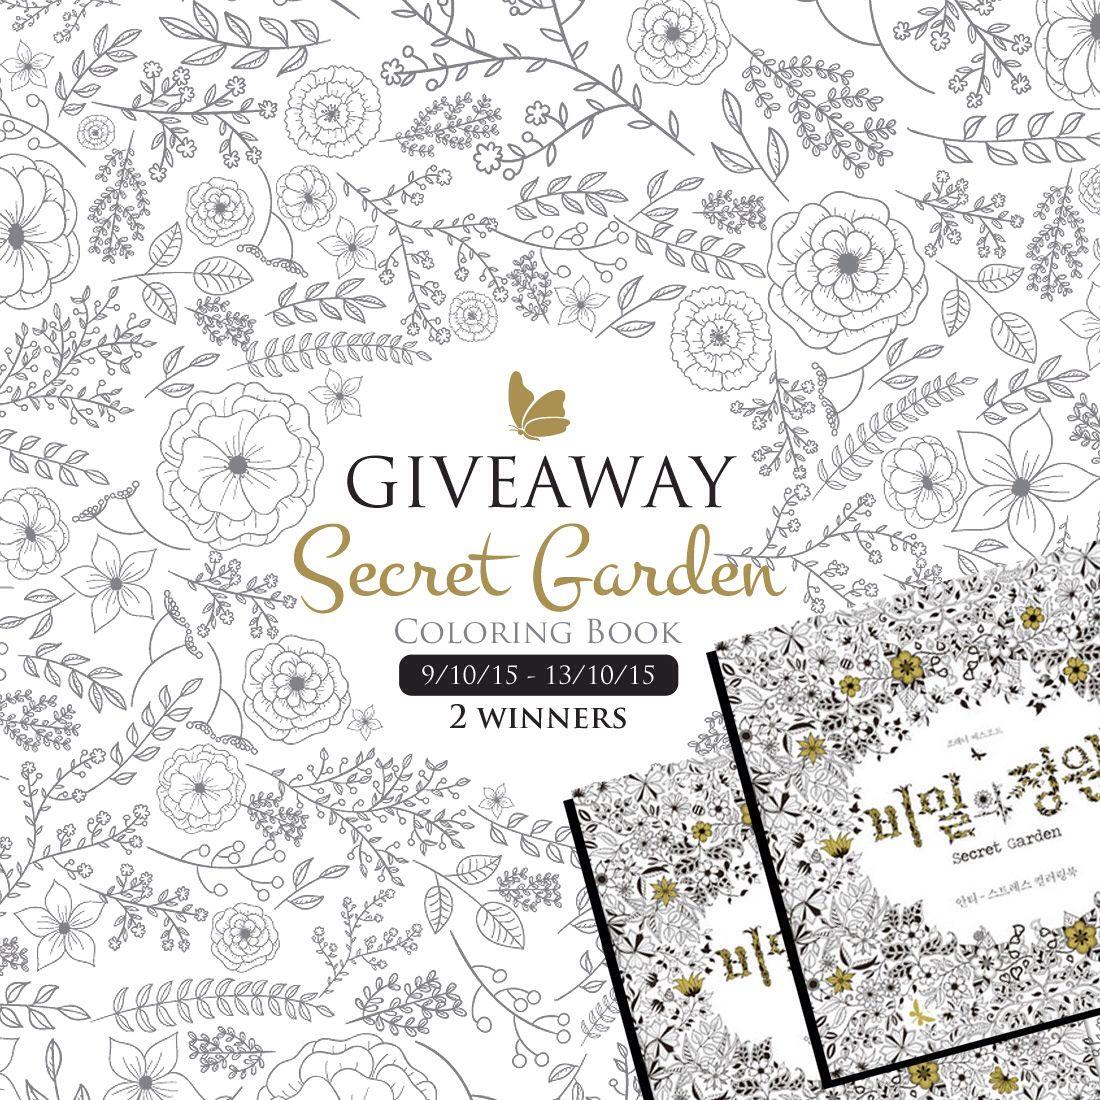 Get Secret Garden Coloring Book For Free Avenue86 Secretgarden